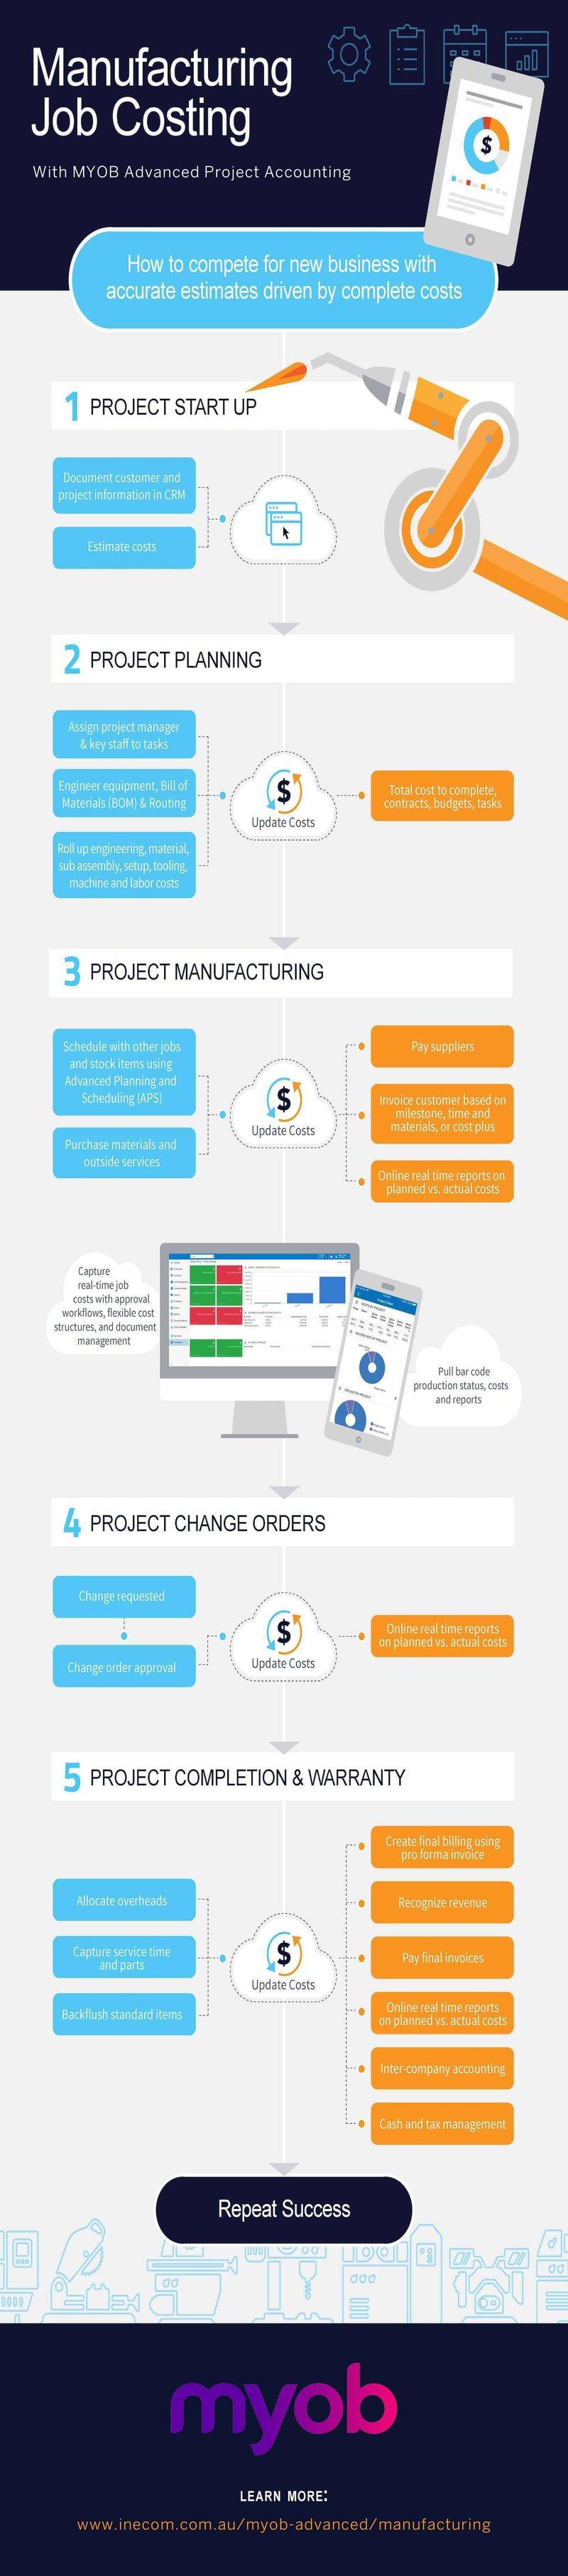 MYOB Advanced Project Manufacturing